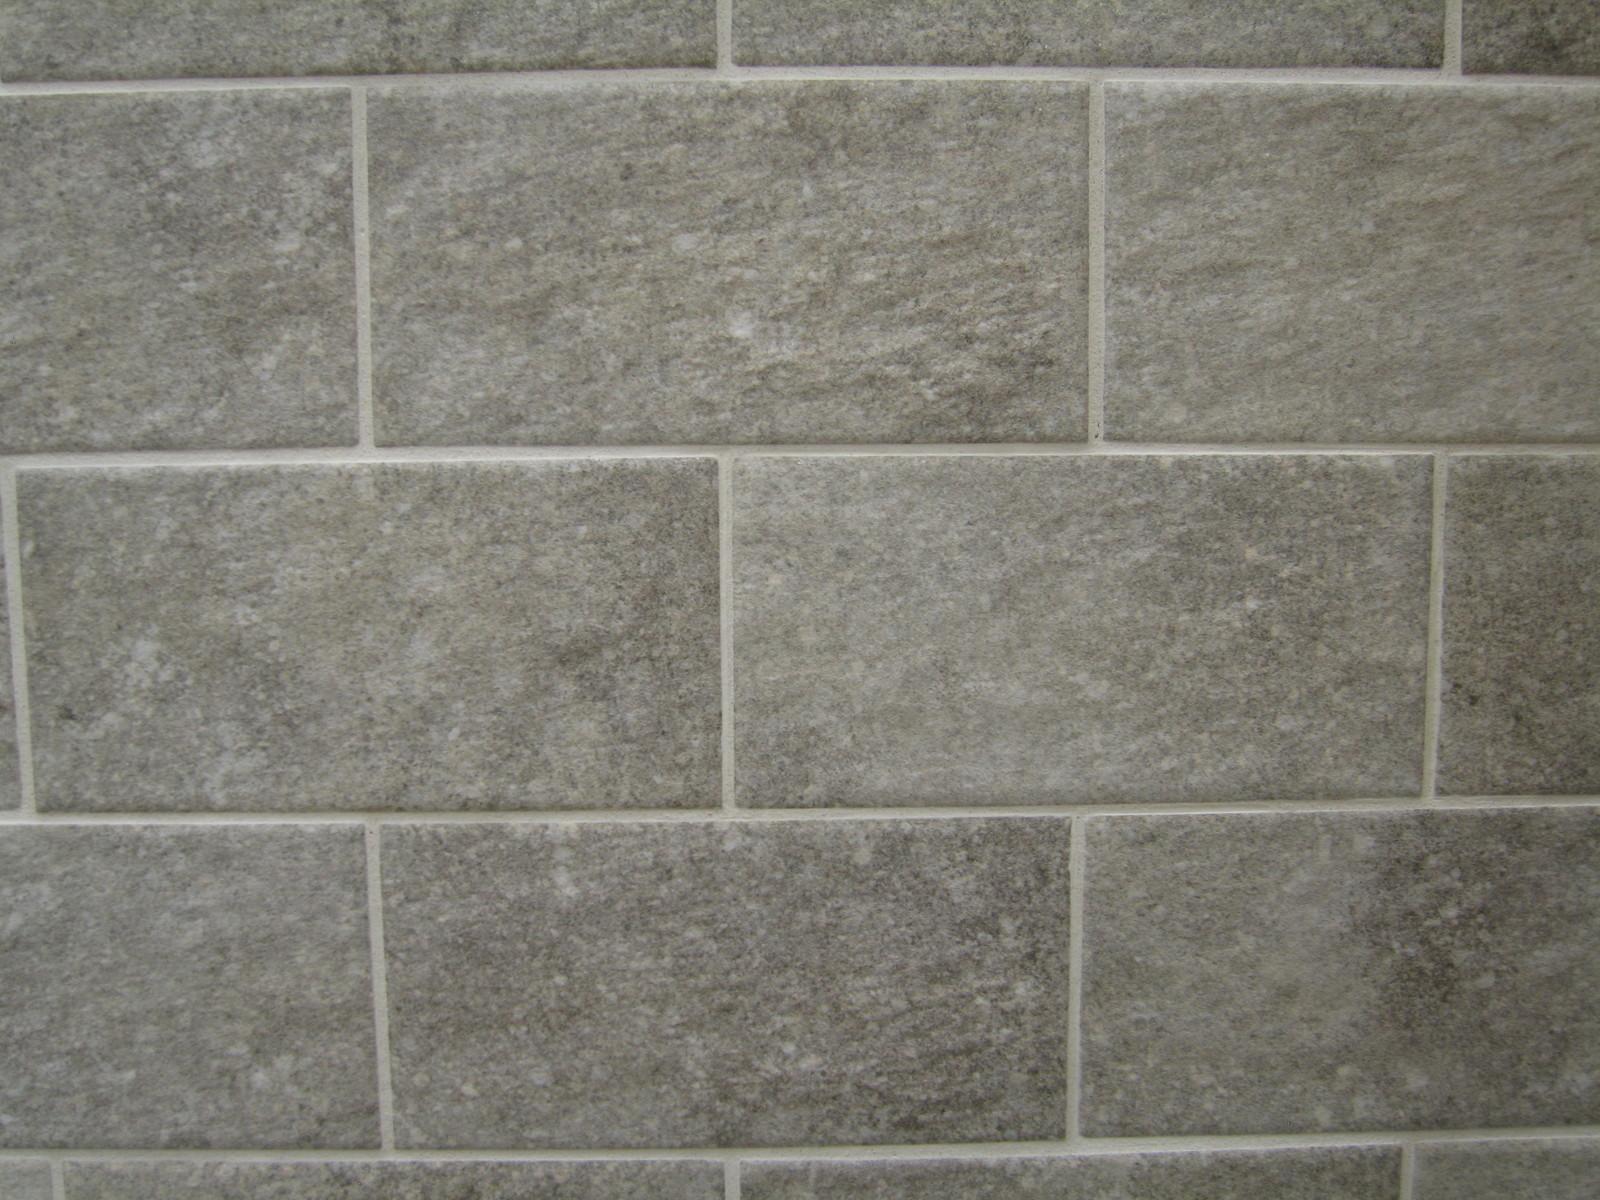 Glazed ceramic tile johnson tiles elegance versatile inc glazed 100 limestone bathroom tiles savior limestone bathroom cdk dailygadgetfo Gallery